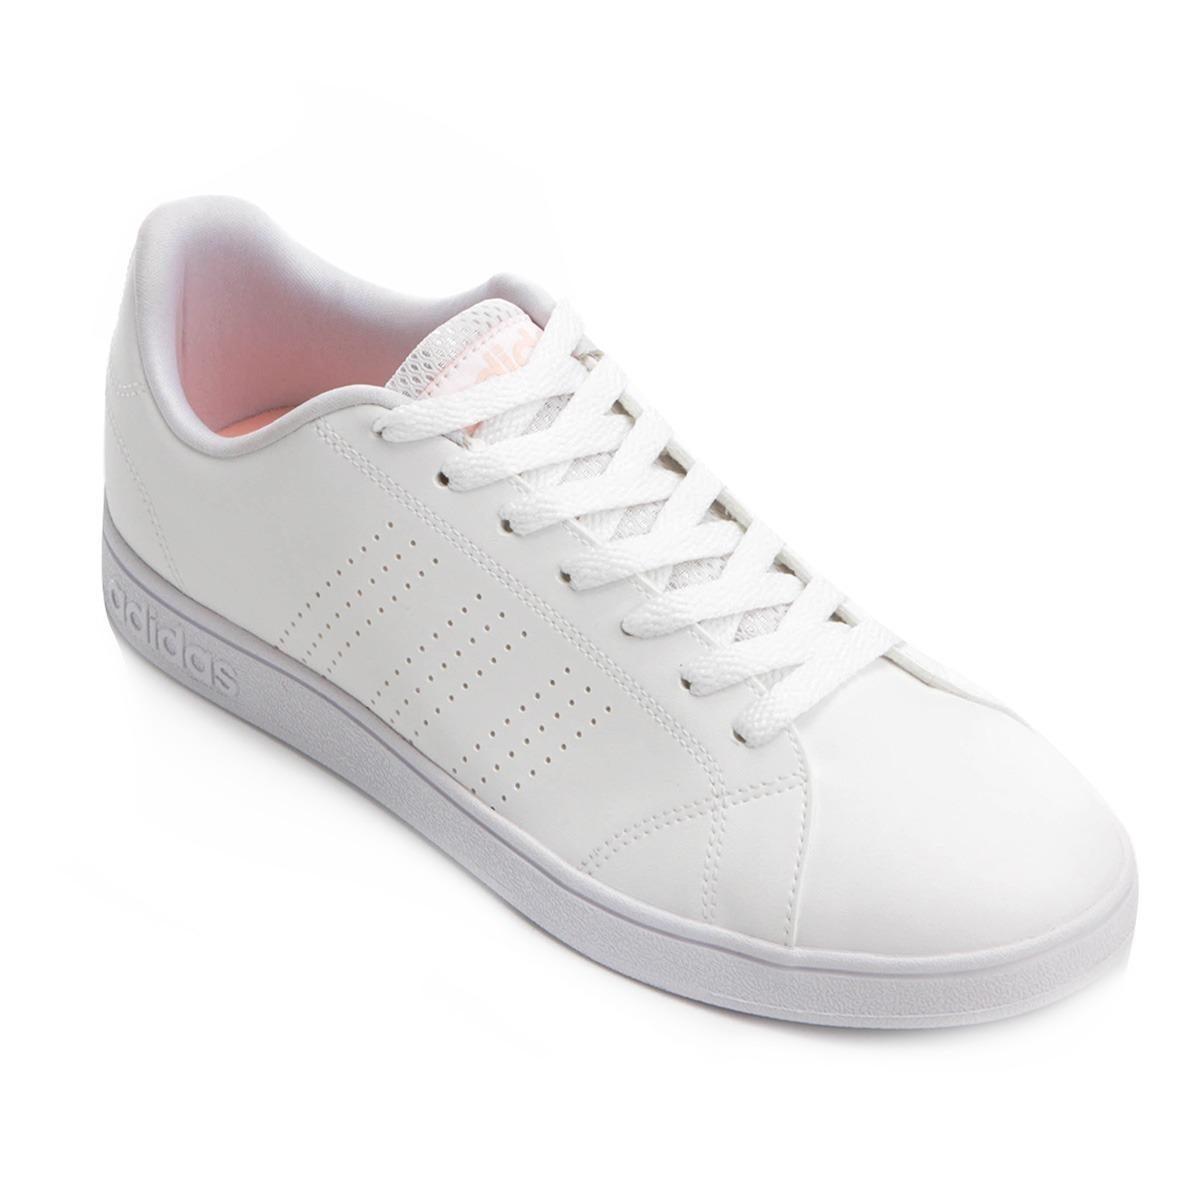 1d8b503d087 Tênis adidas Advantage Vs Clean Feminino - Original - R  229